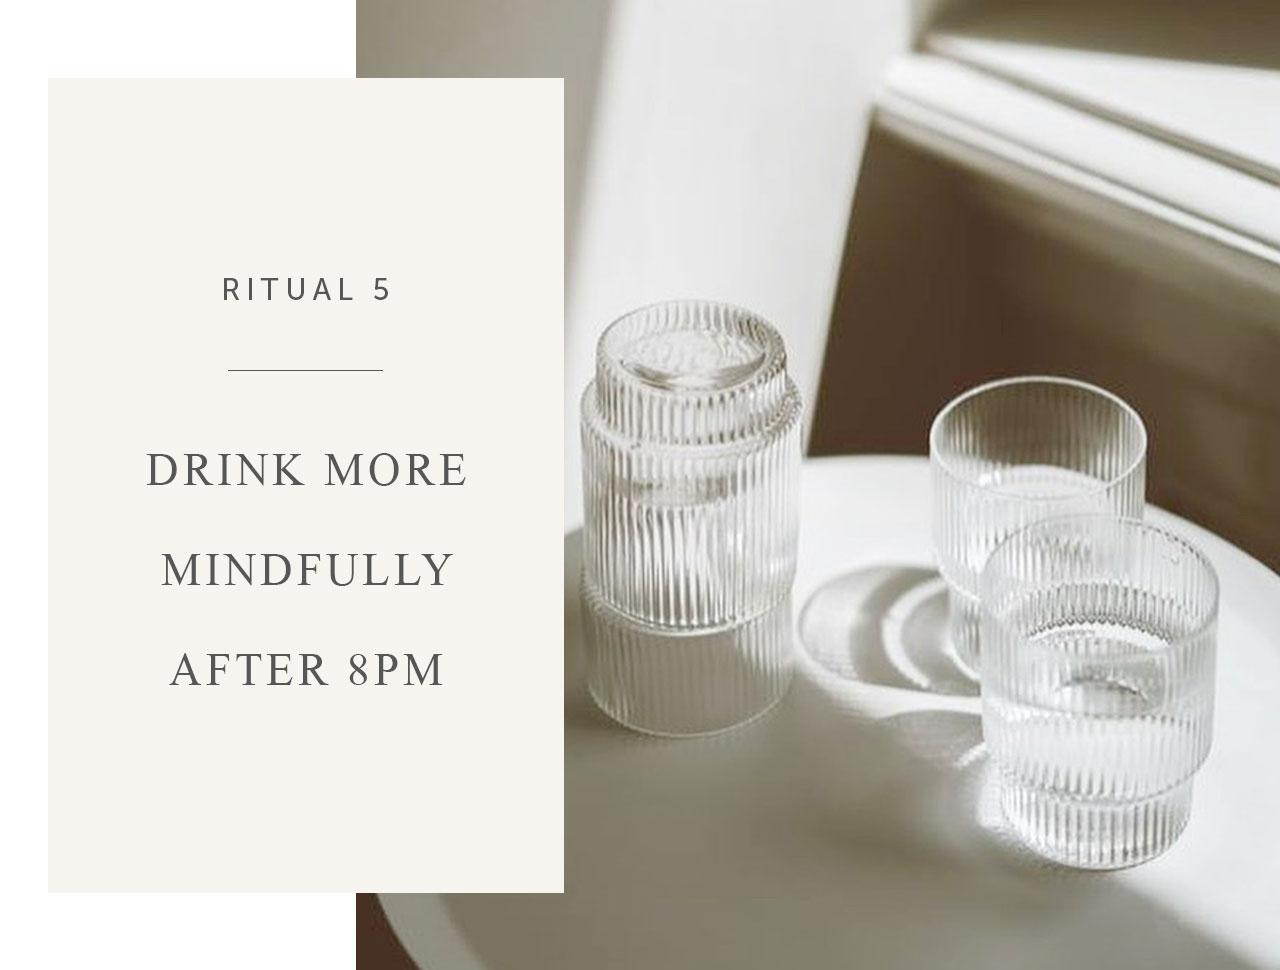 Bedtime ritual 5